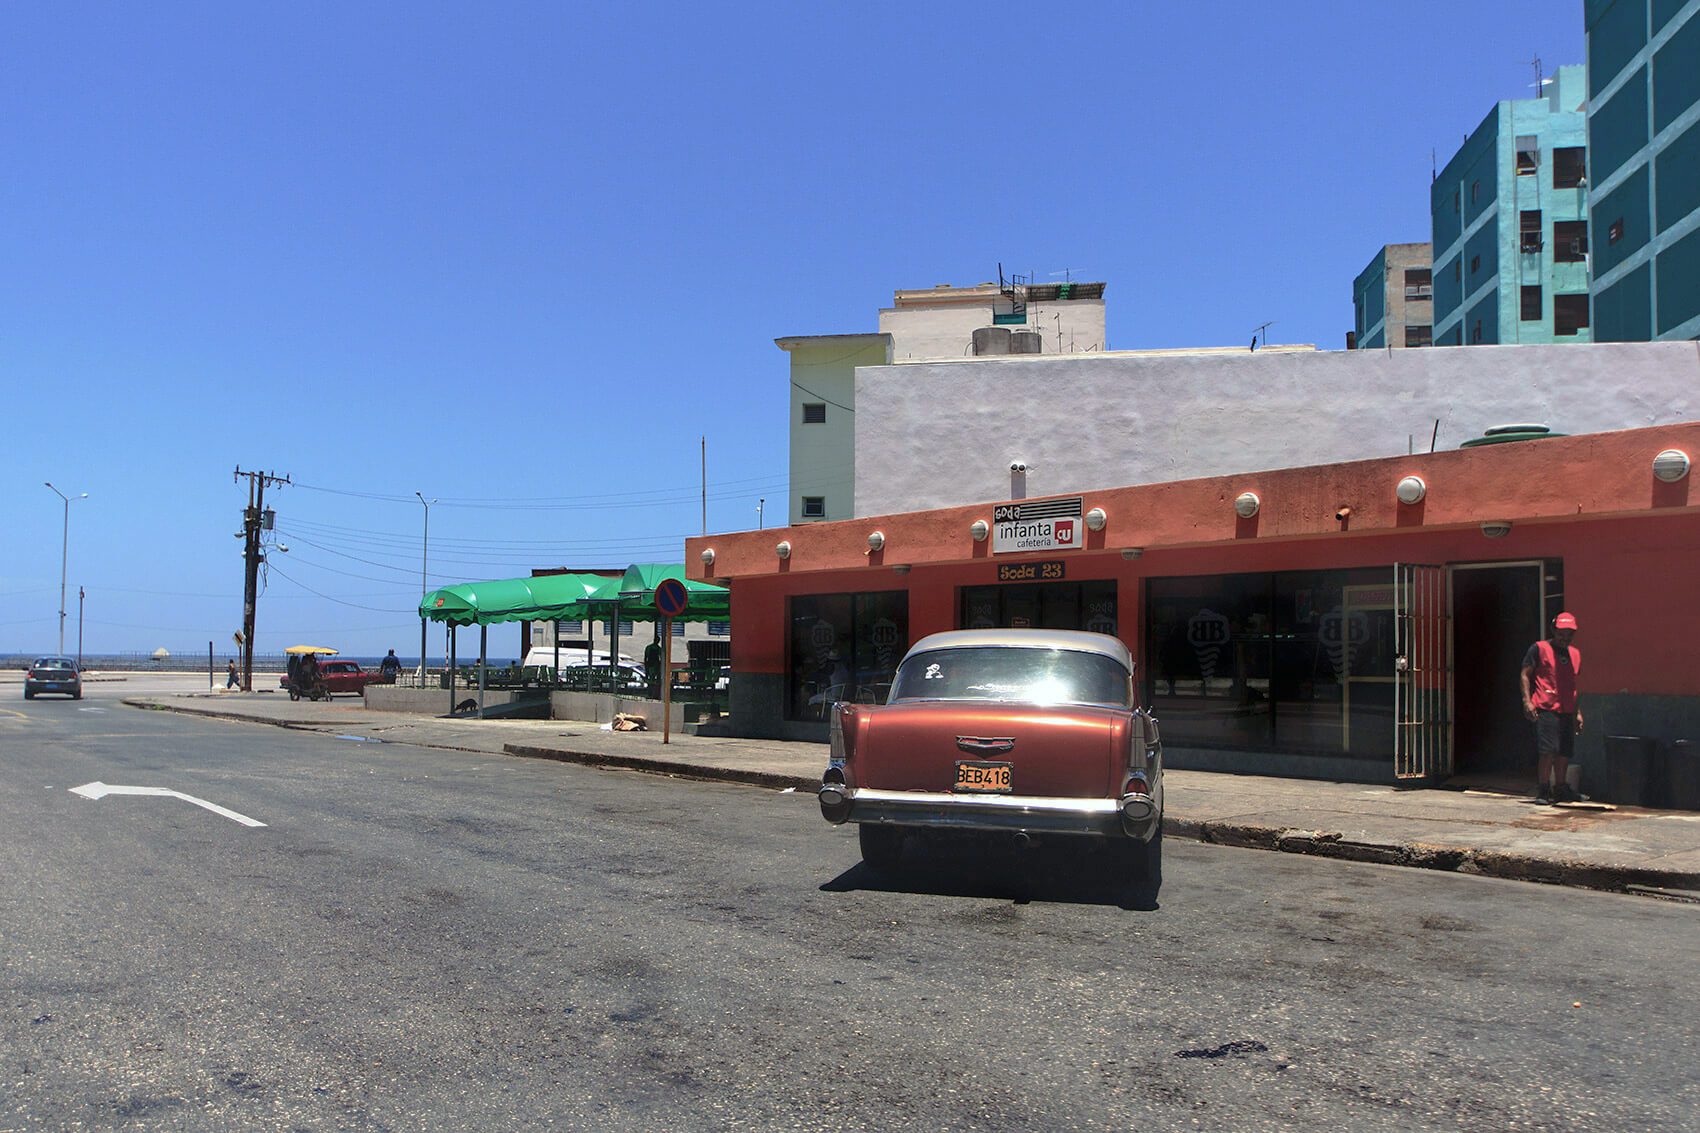 Havana Colours